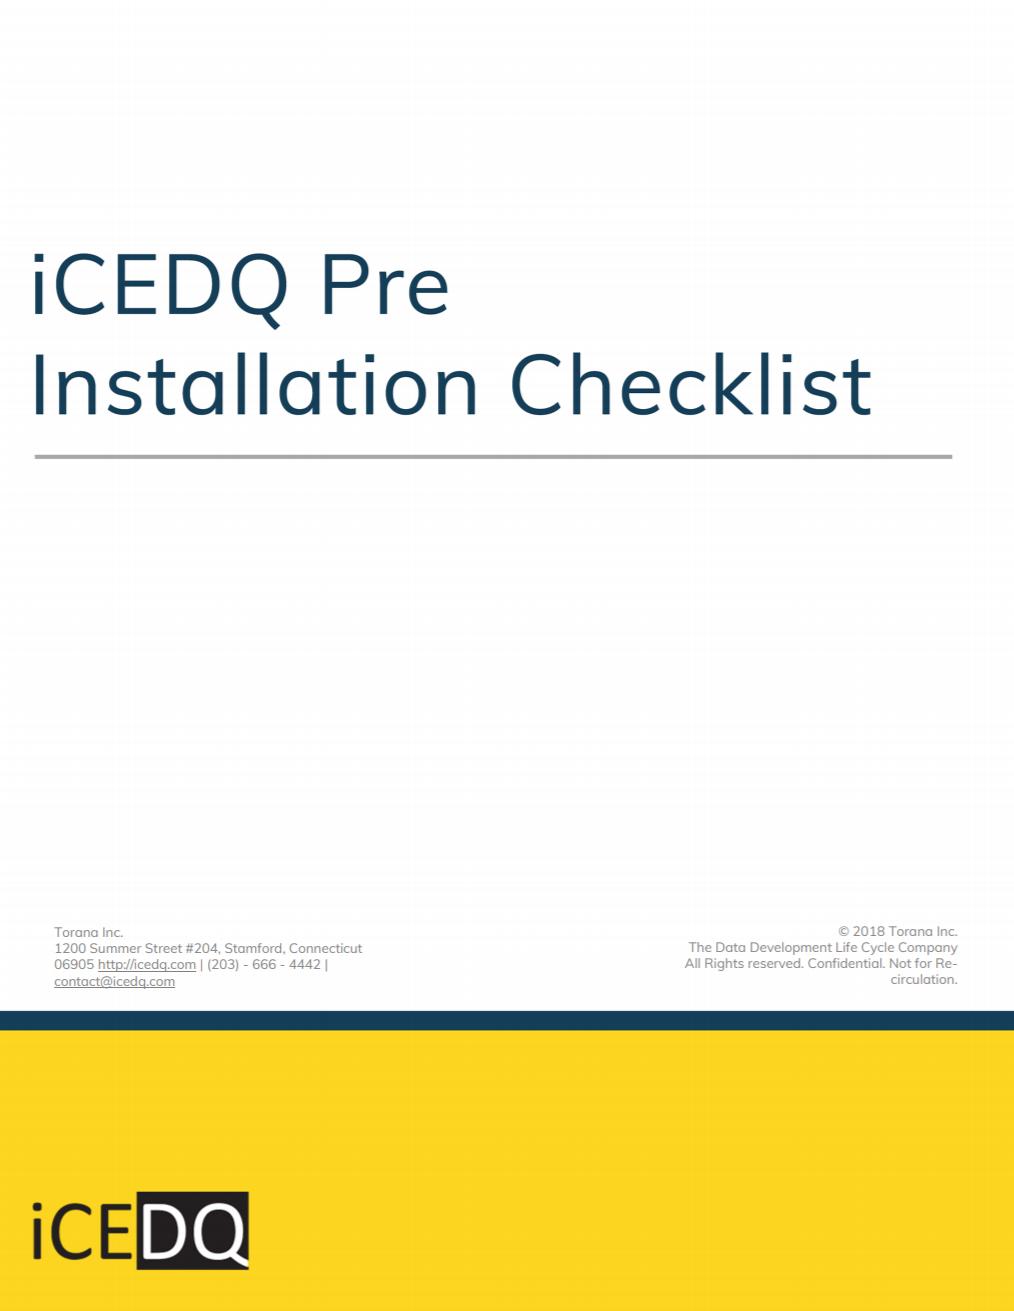 iCEDQ Pre Installation Checklist-iCEDQ